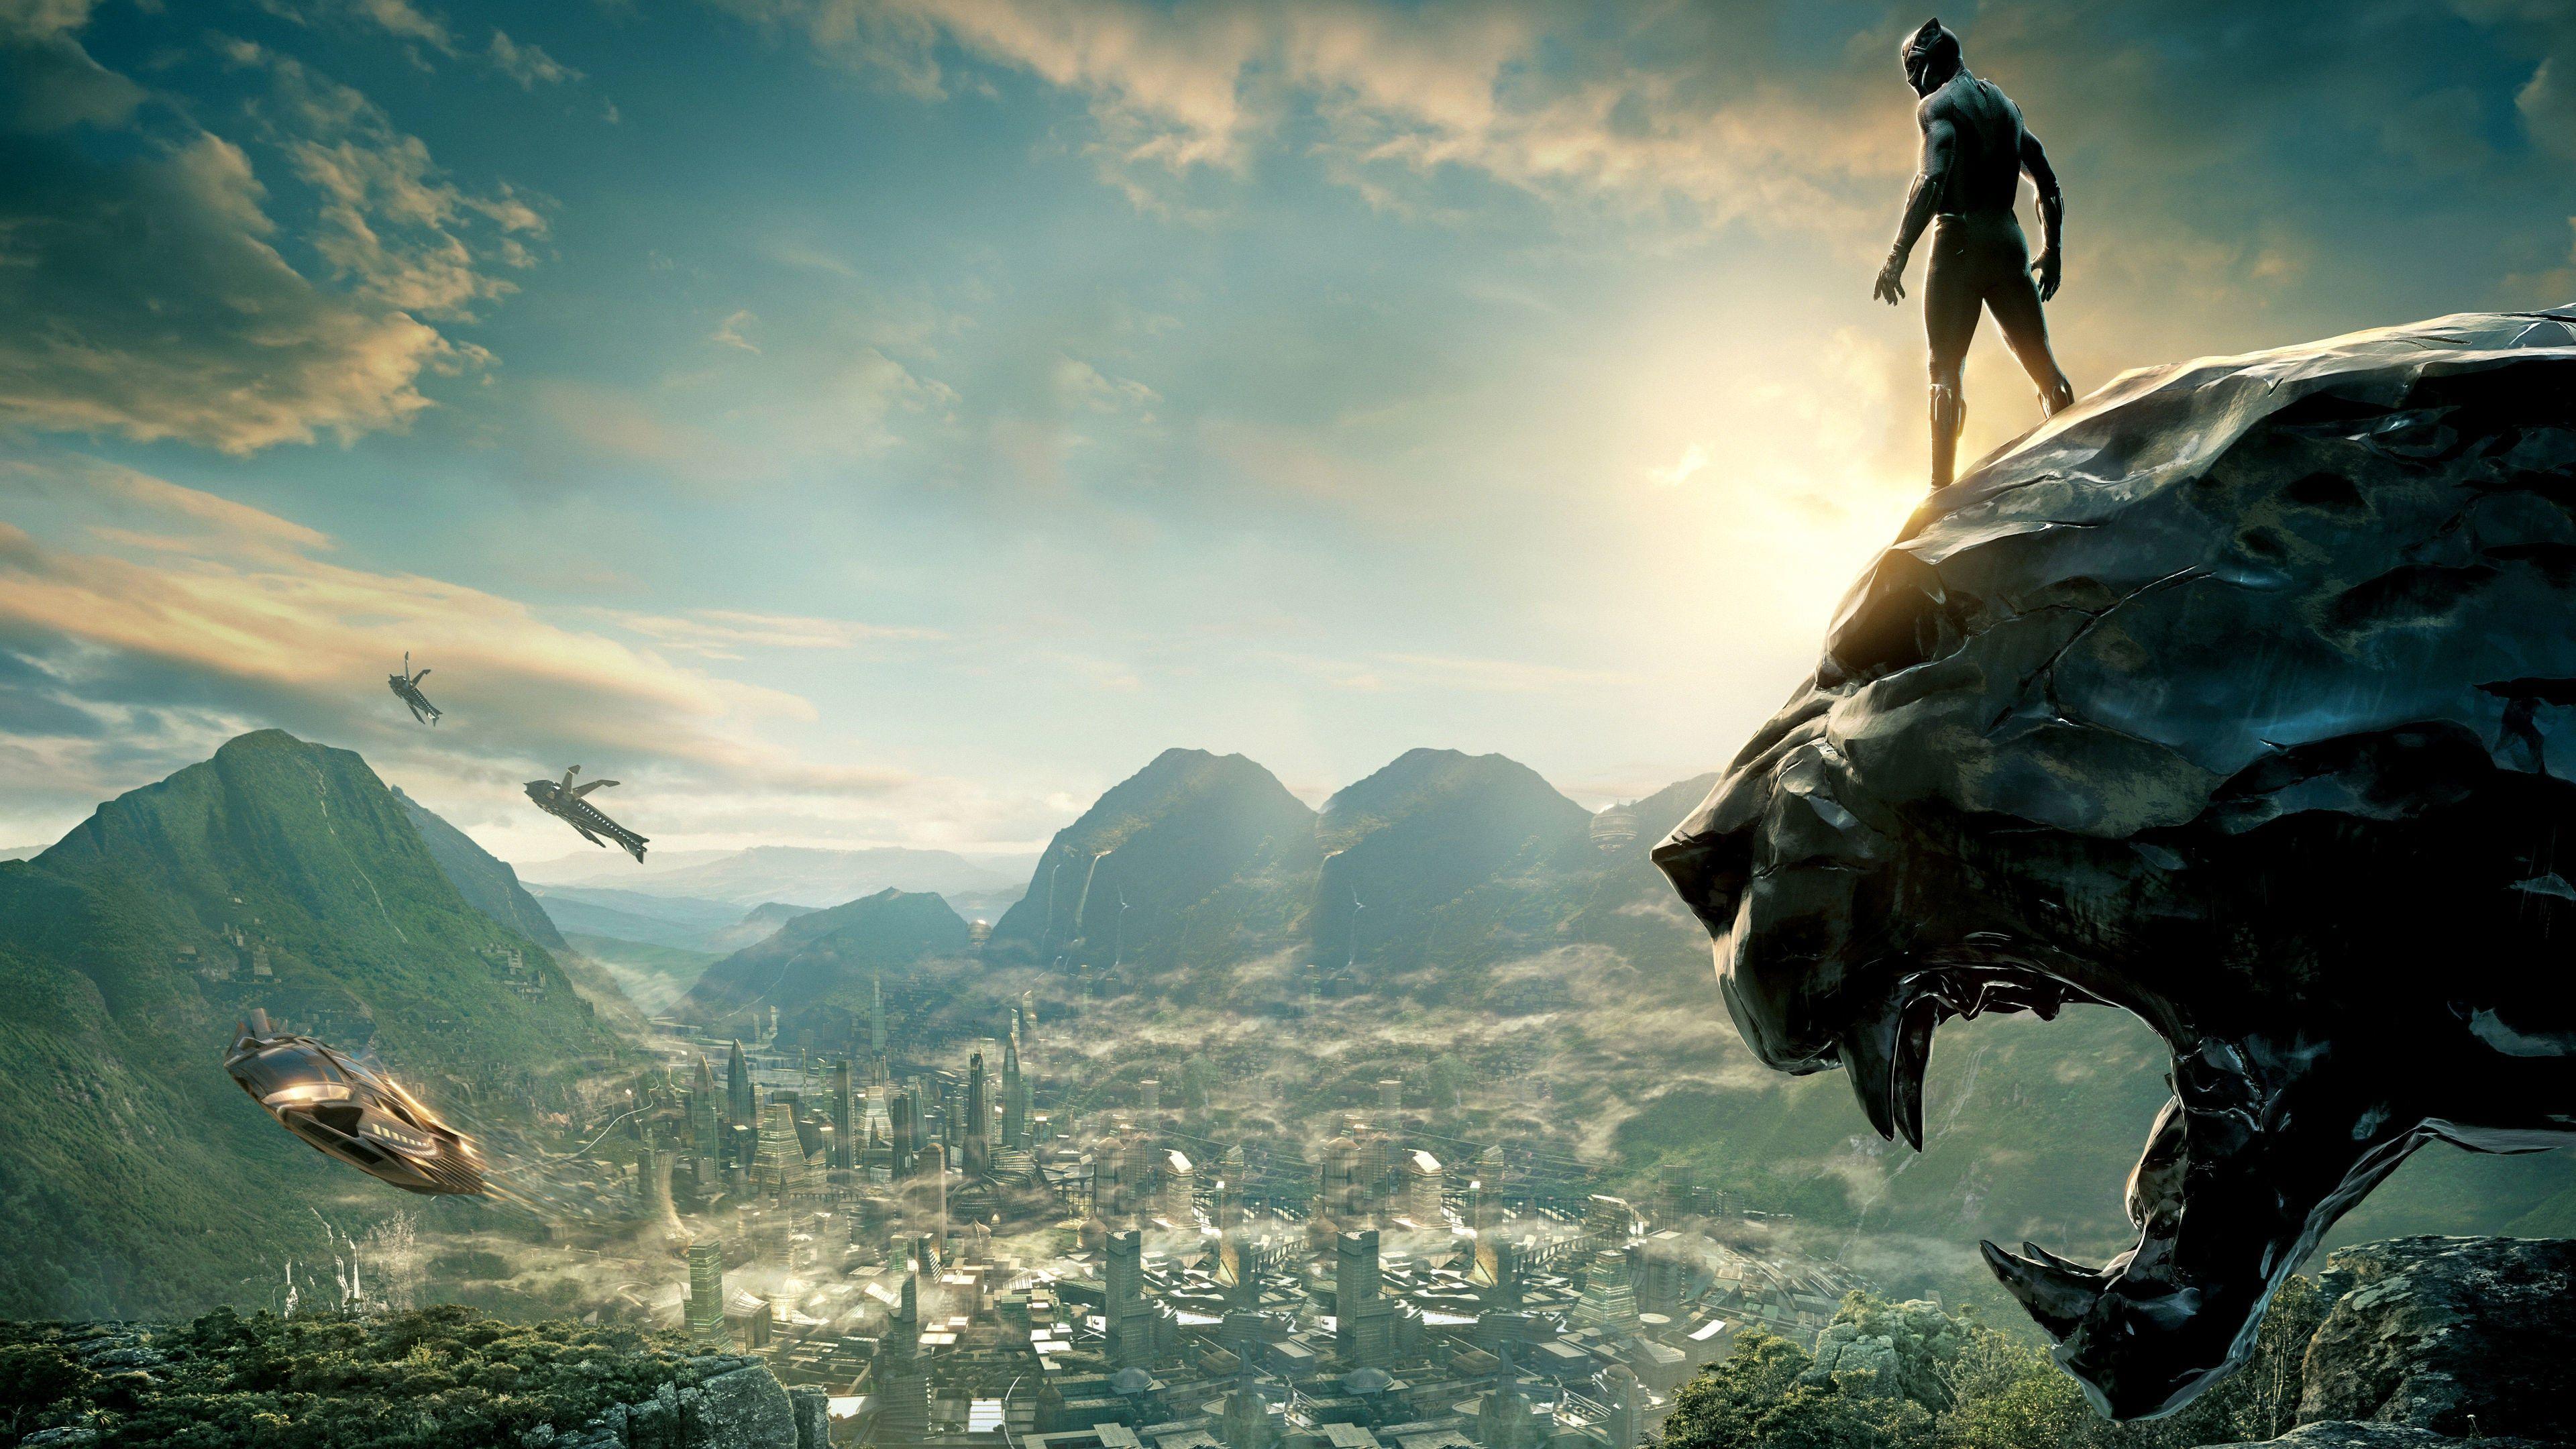 Fekete Parduc 2018 Online Teljes Film Filmek Magyarul Letoltes Hd T Challa Apja Halalat Kovetoen Ha Black Panther Black Panther 2018 Black Panther Movie Poster